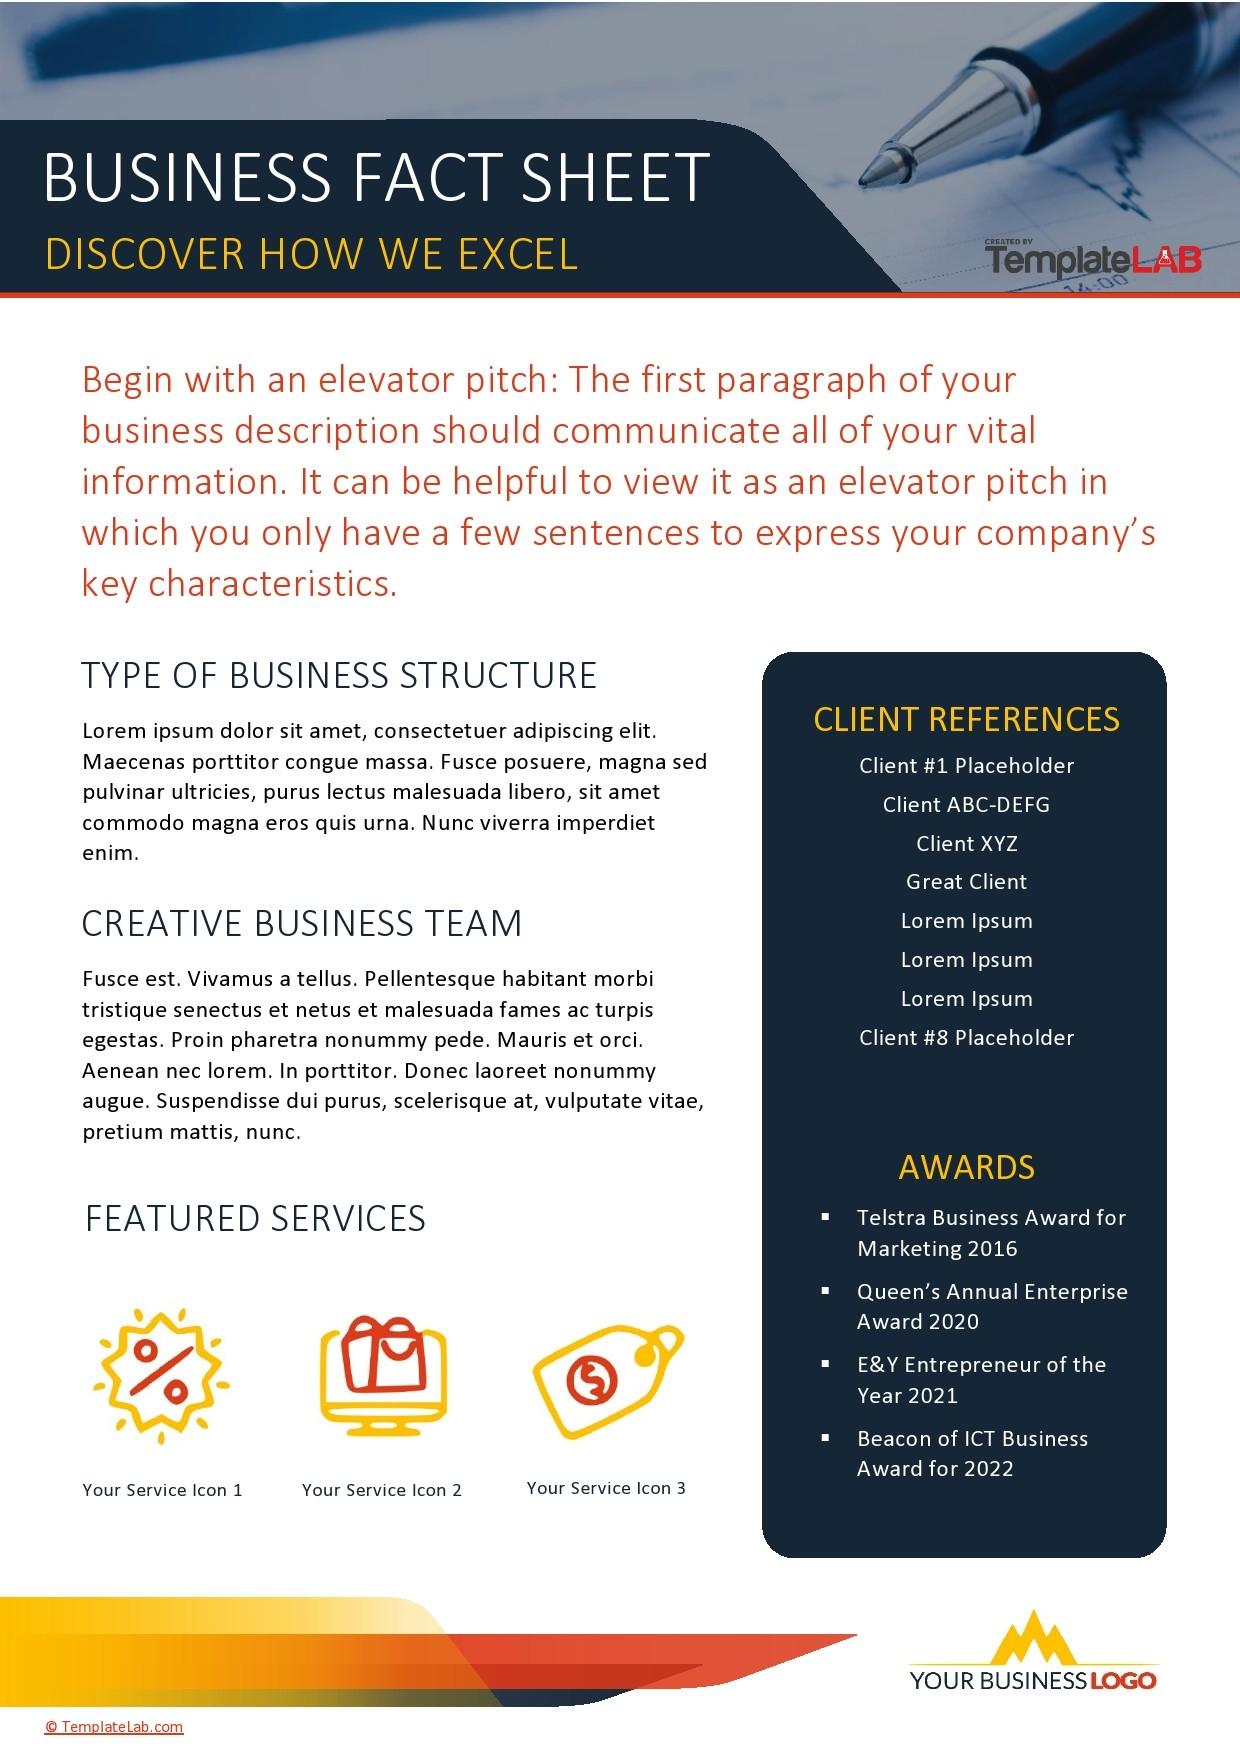 Free Business Fact Sheet Template - TemplateLab.com